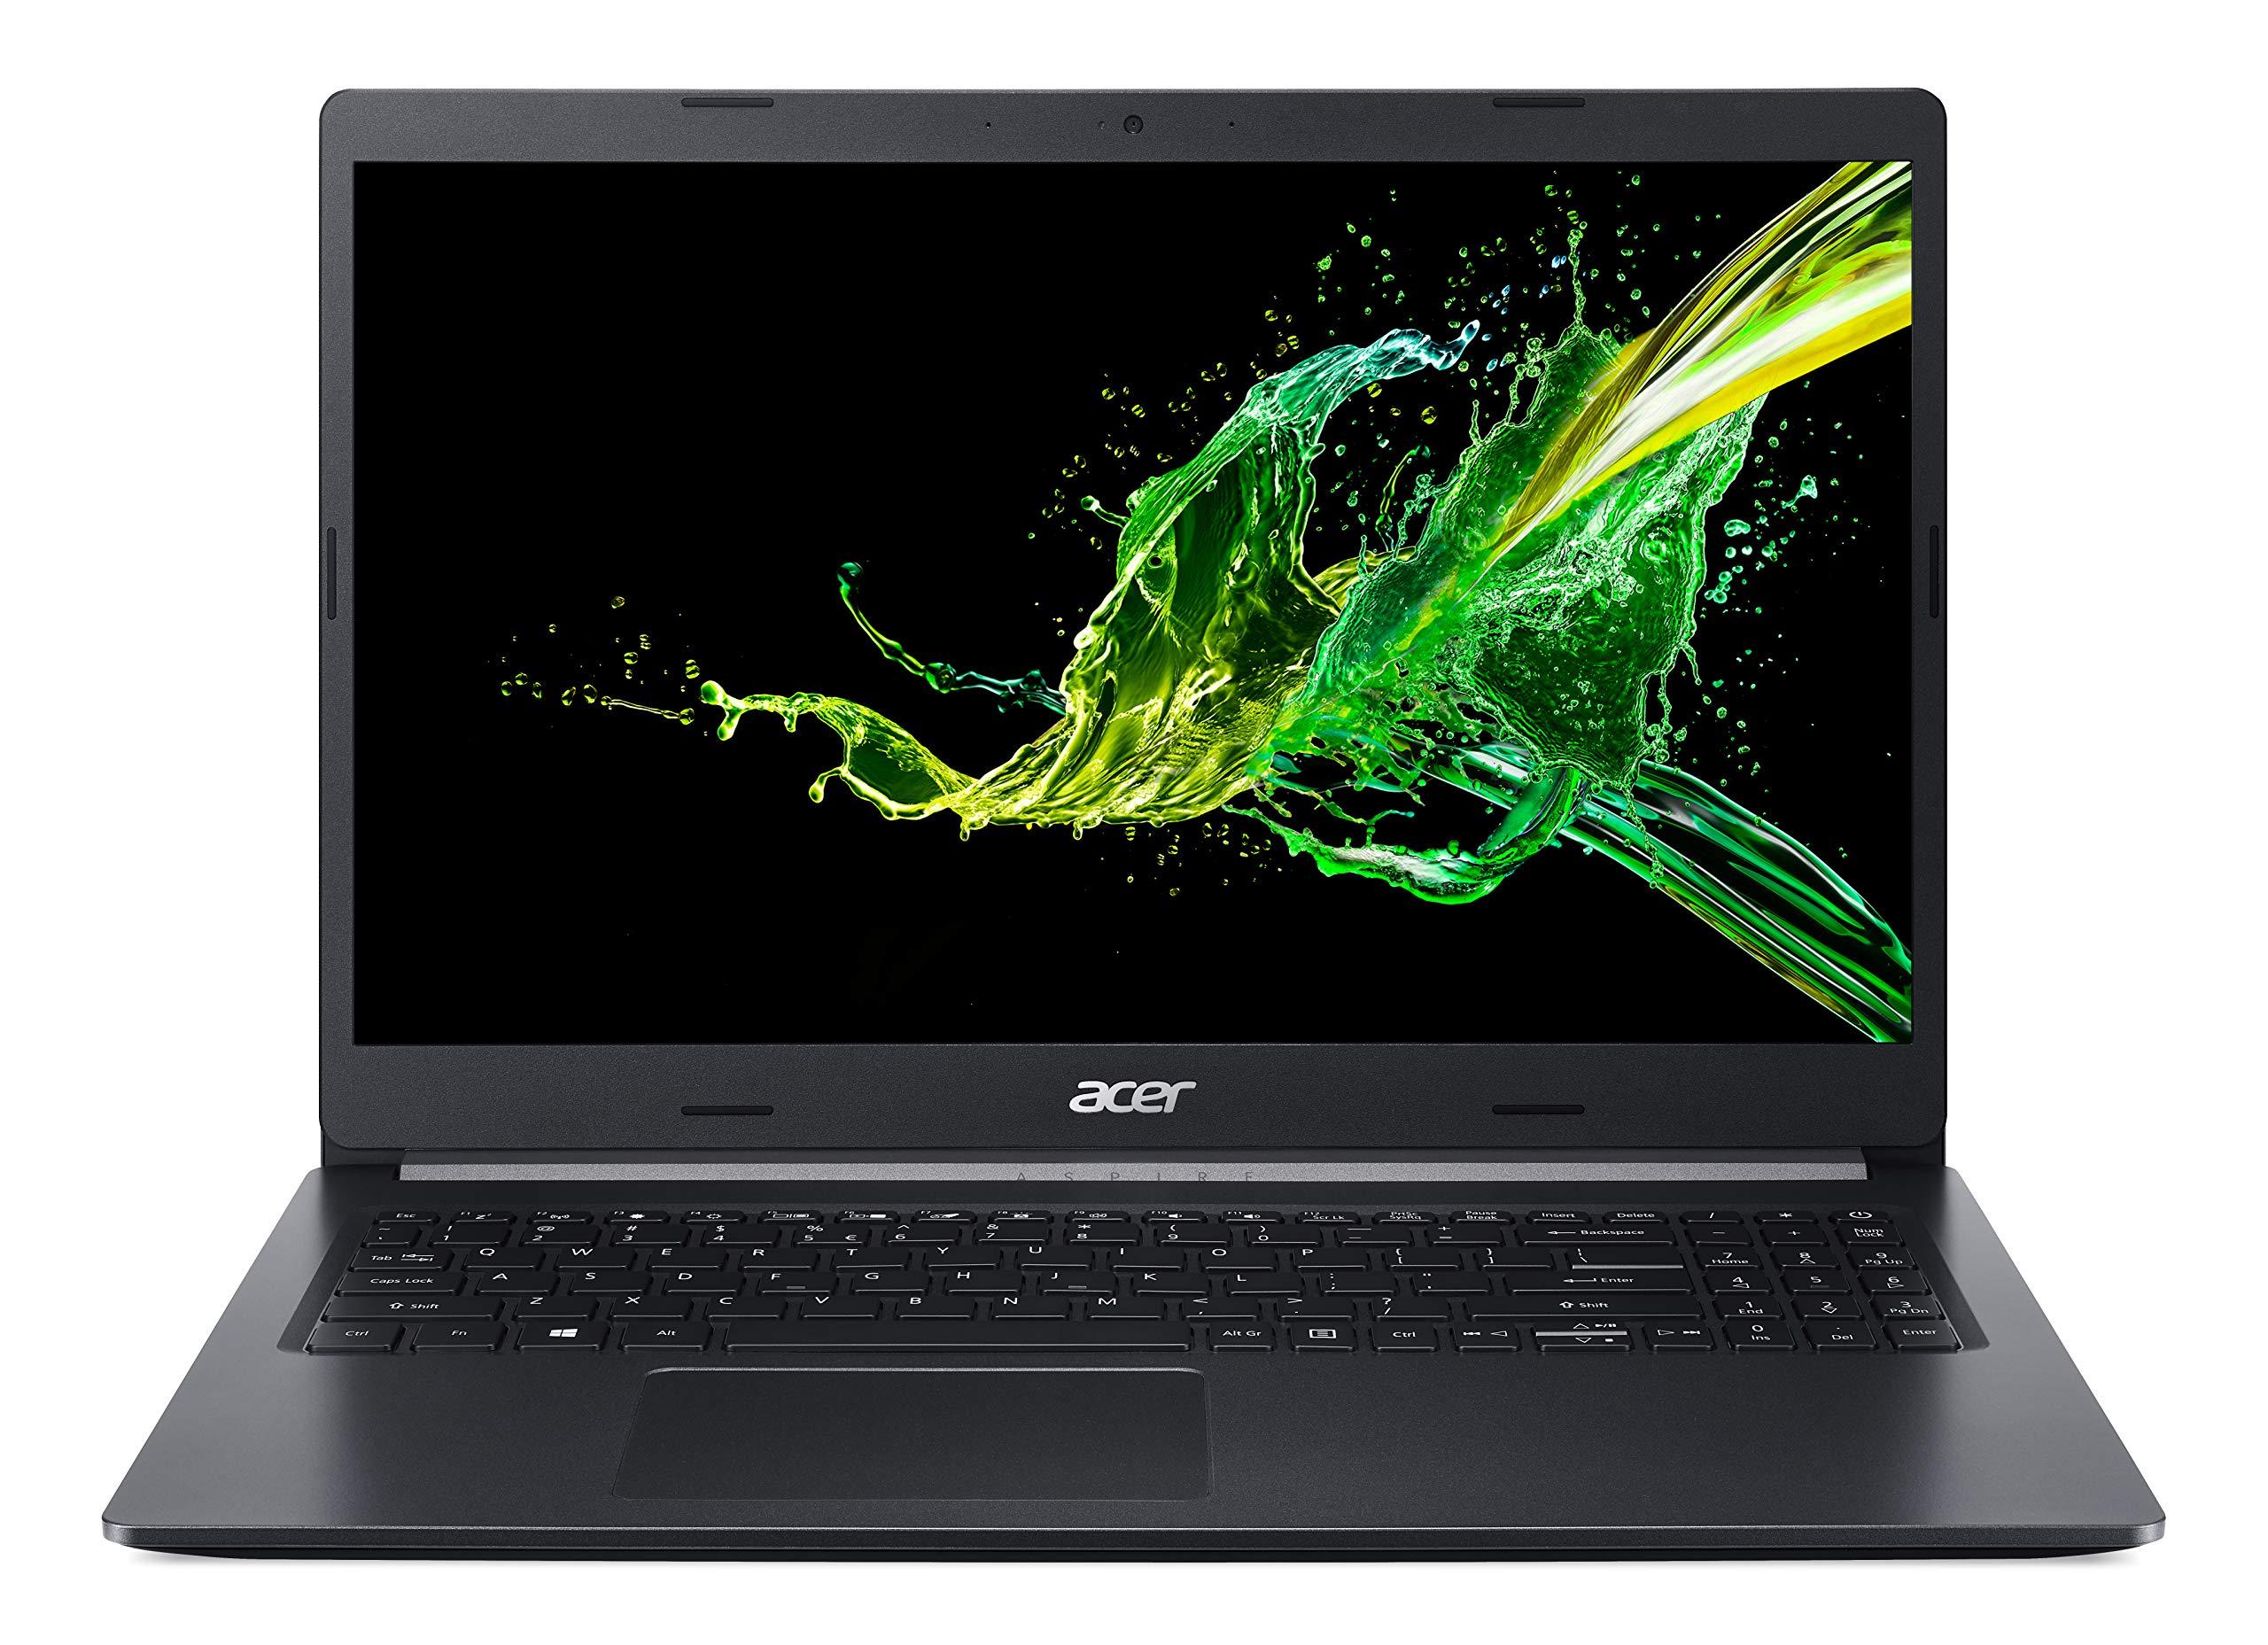 Acer-Aspire-5-A515-54G-156-inch-Laptop-Intel-Core-i5-8265U-8GB-RAM-256GB-SSD-Nvidia-GeForce-MX250-Full-HD-Display-Windows-10